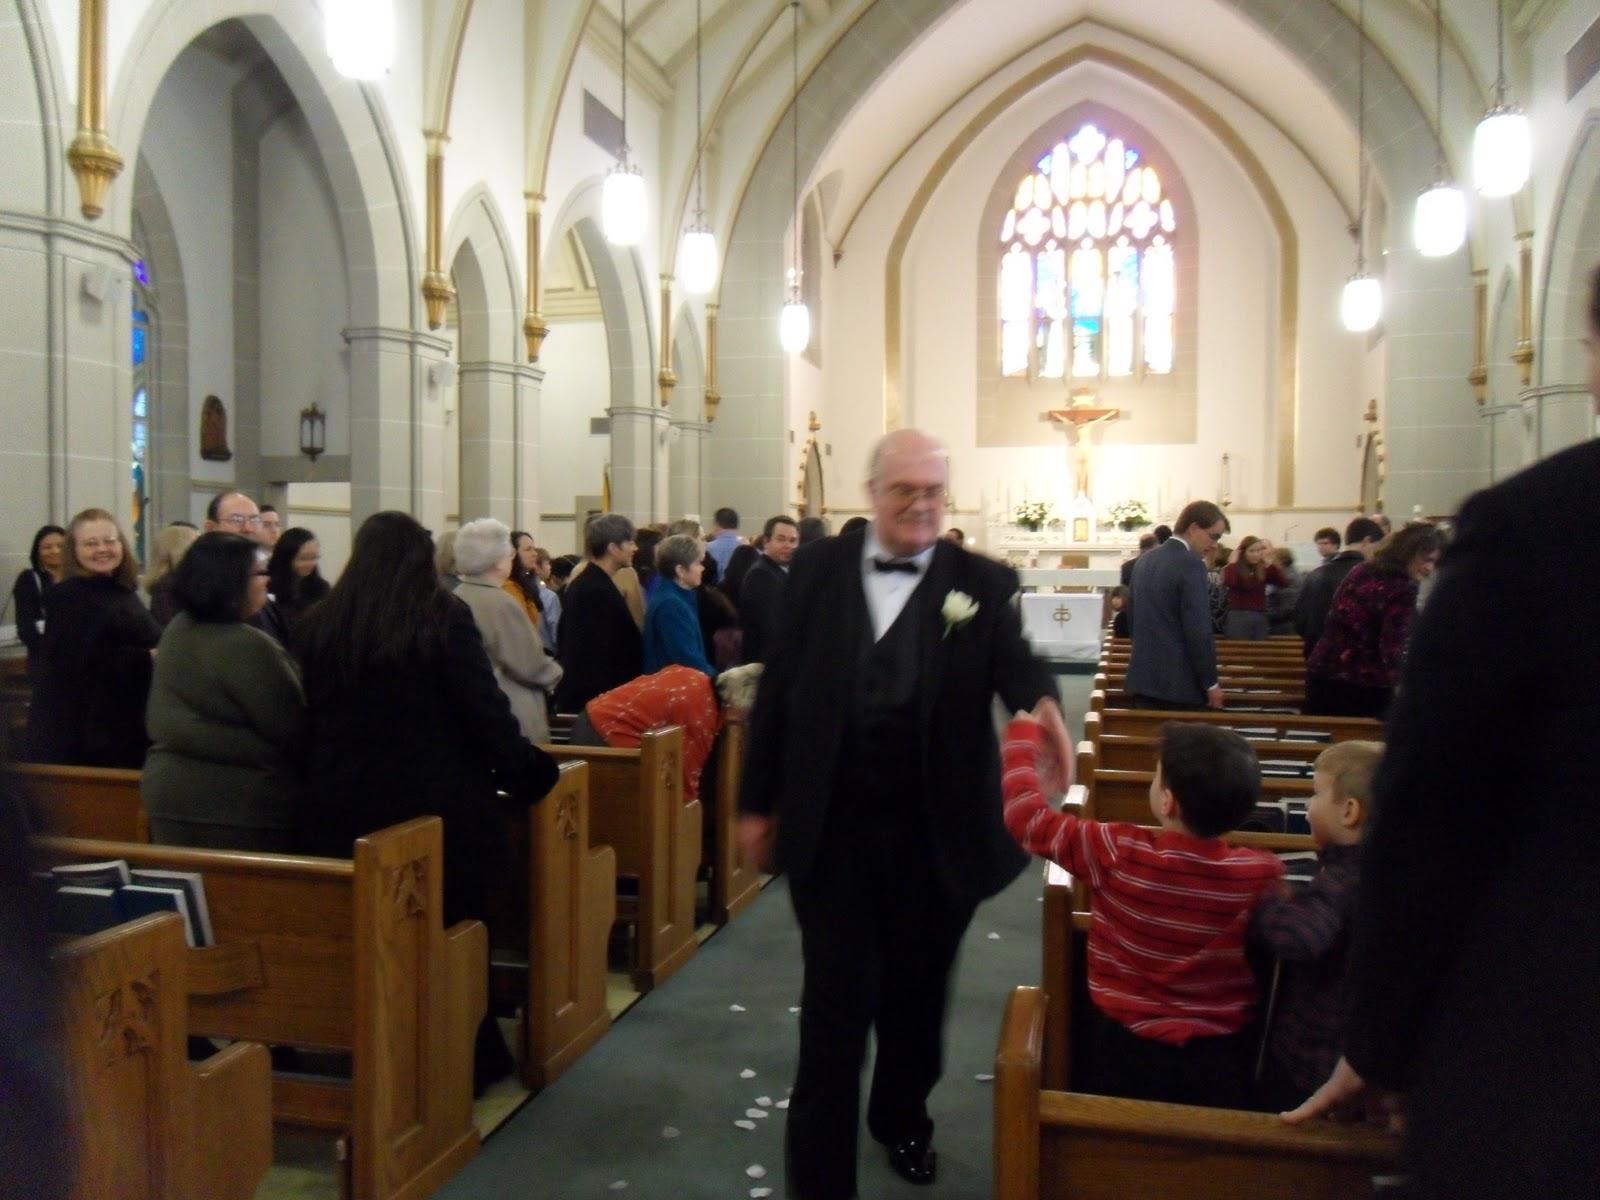 Our Wedding, photos by Rachel Perez - SAM_0174.JPG